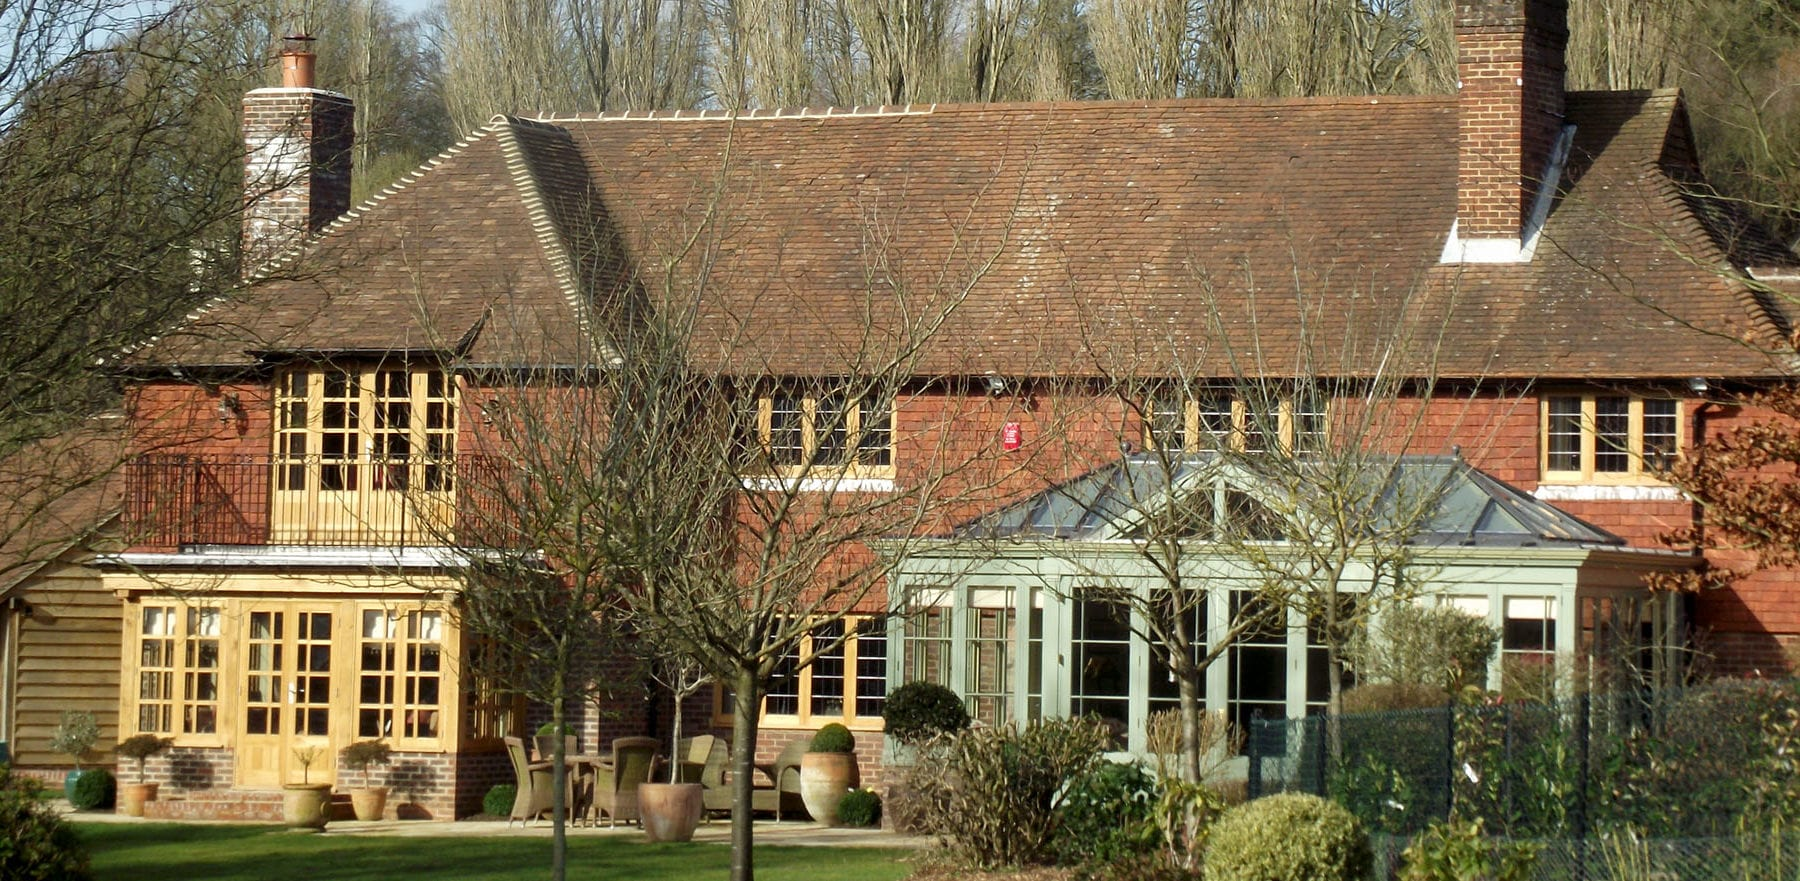 Lifestiles - Handmade Restoration Clay Roof Tiles - Seale, England